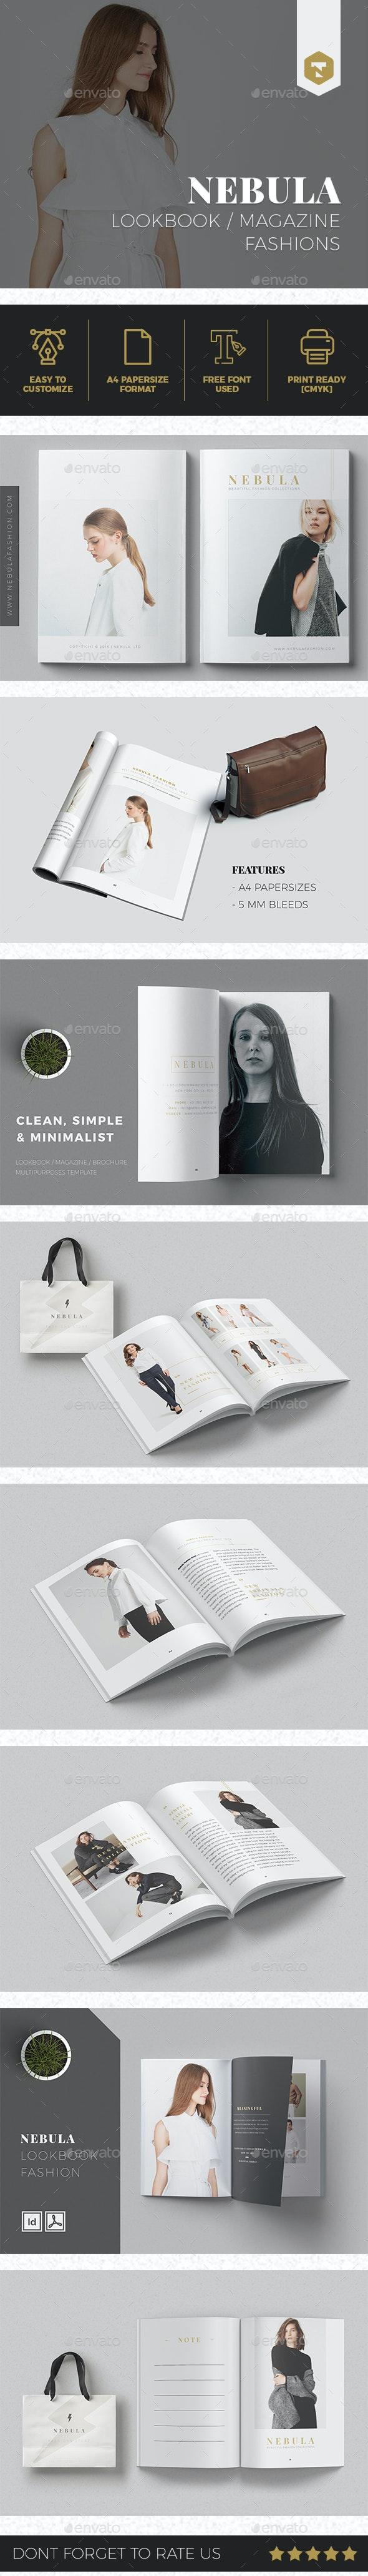 NEBULA | Lookbook/Magazine Fashion - Brochures Print Templates